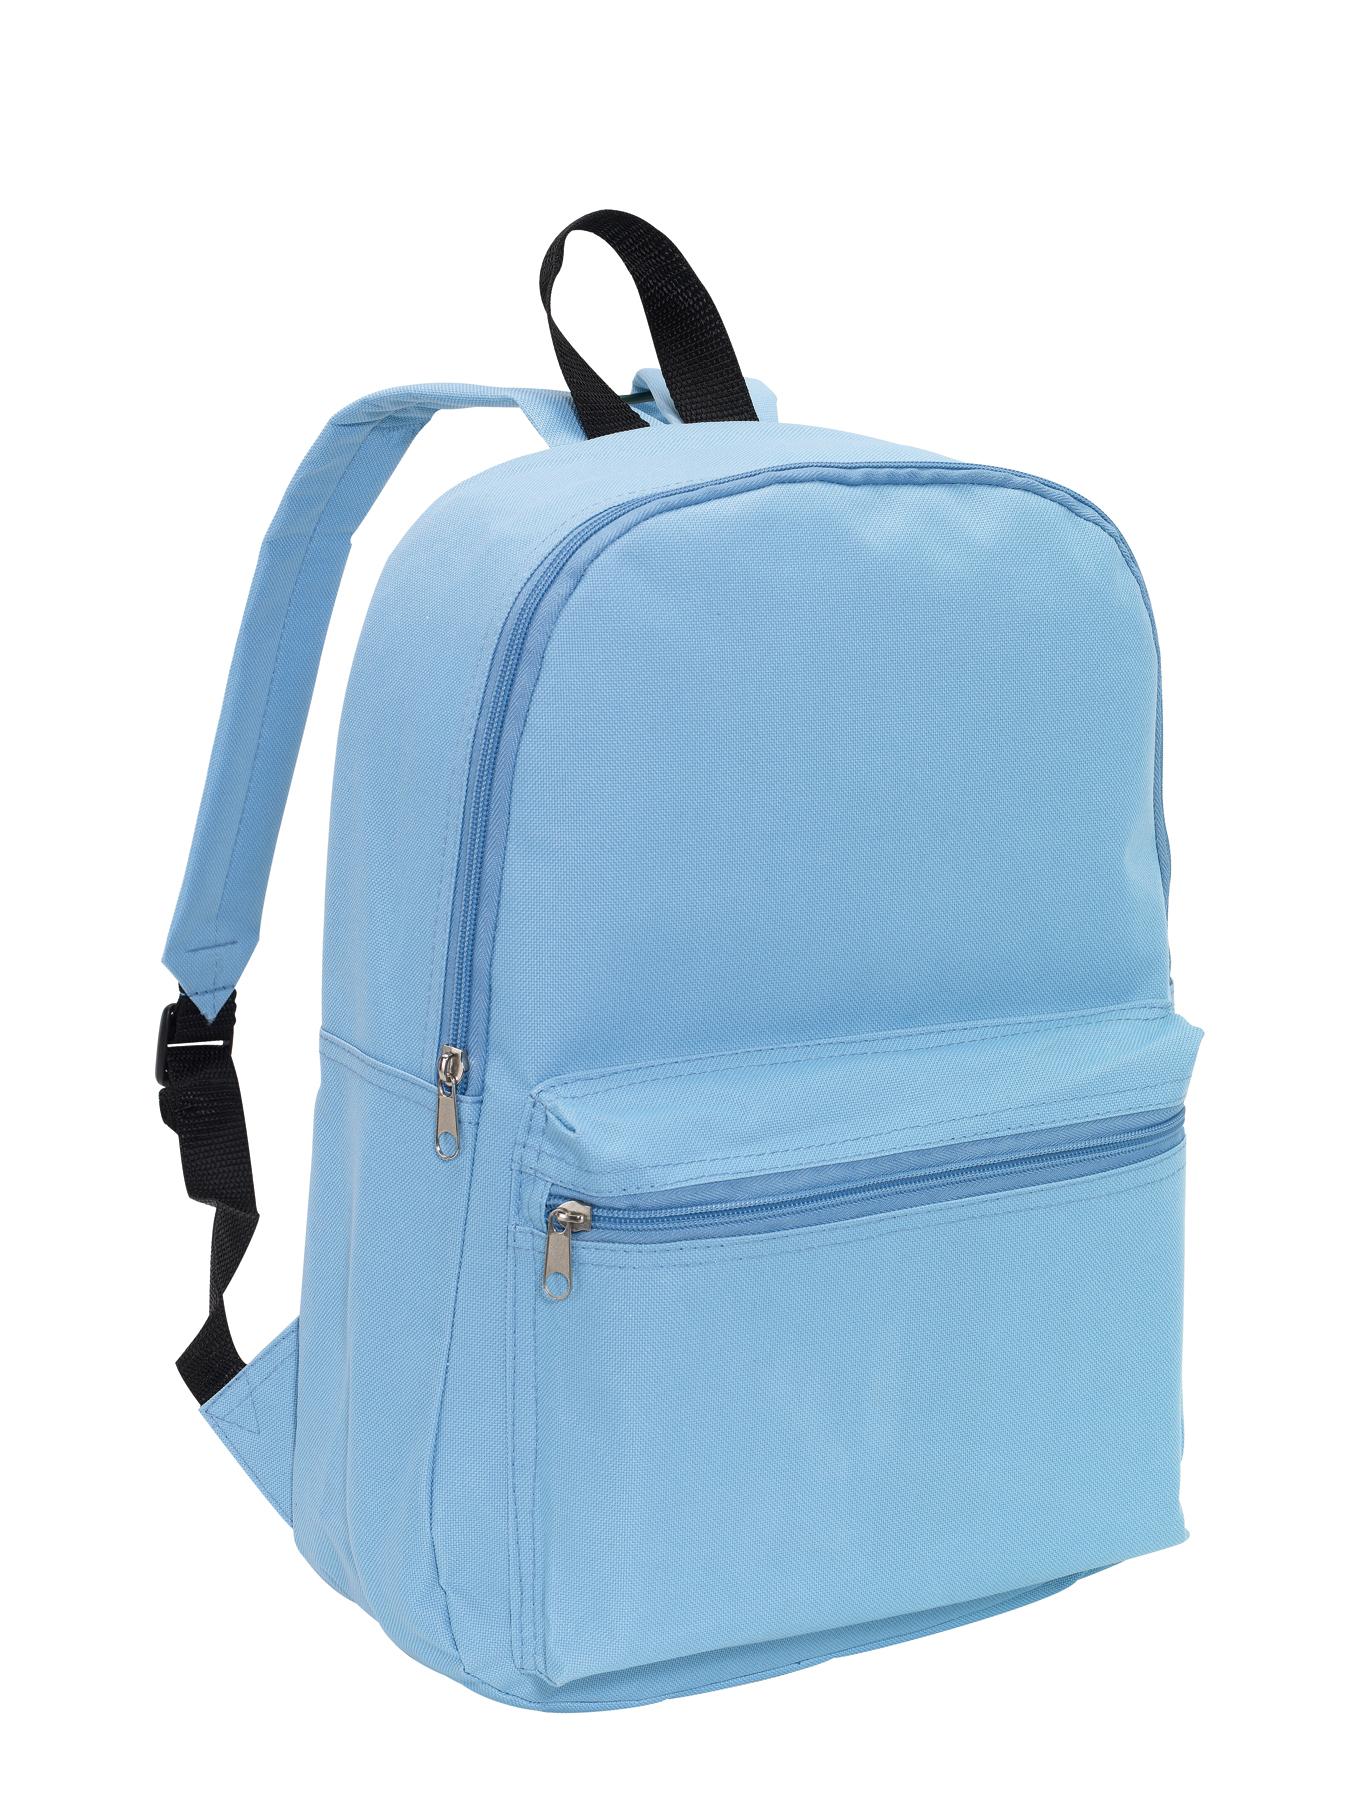 Plecak CHAP, jasnoniebieski